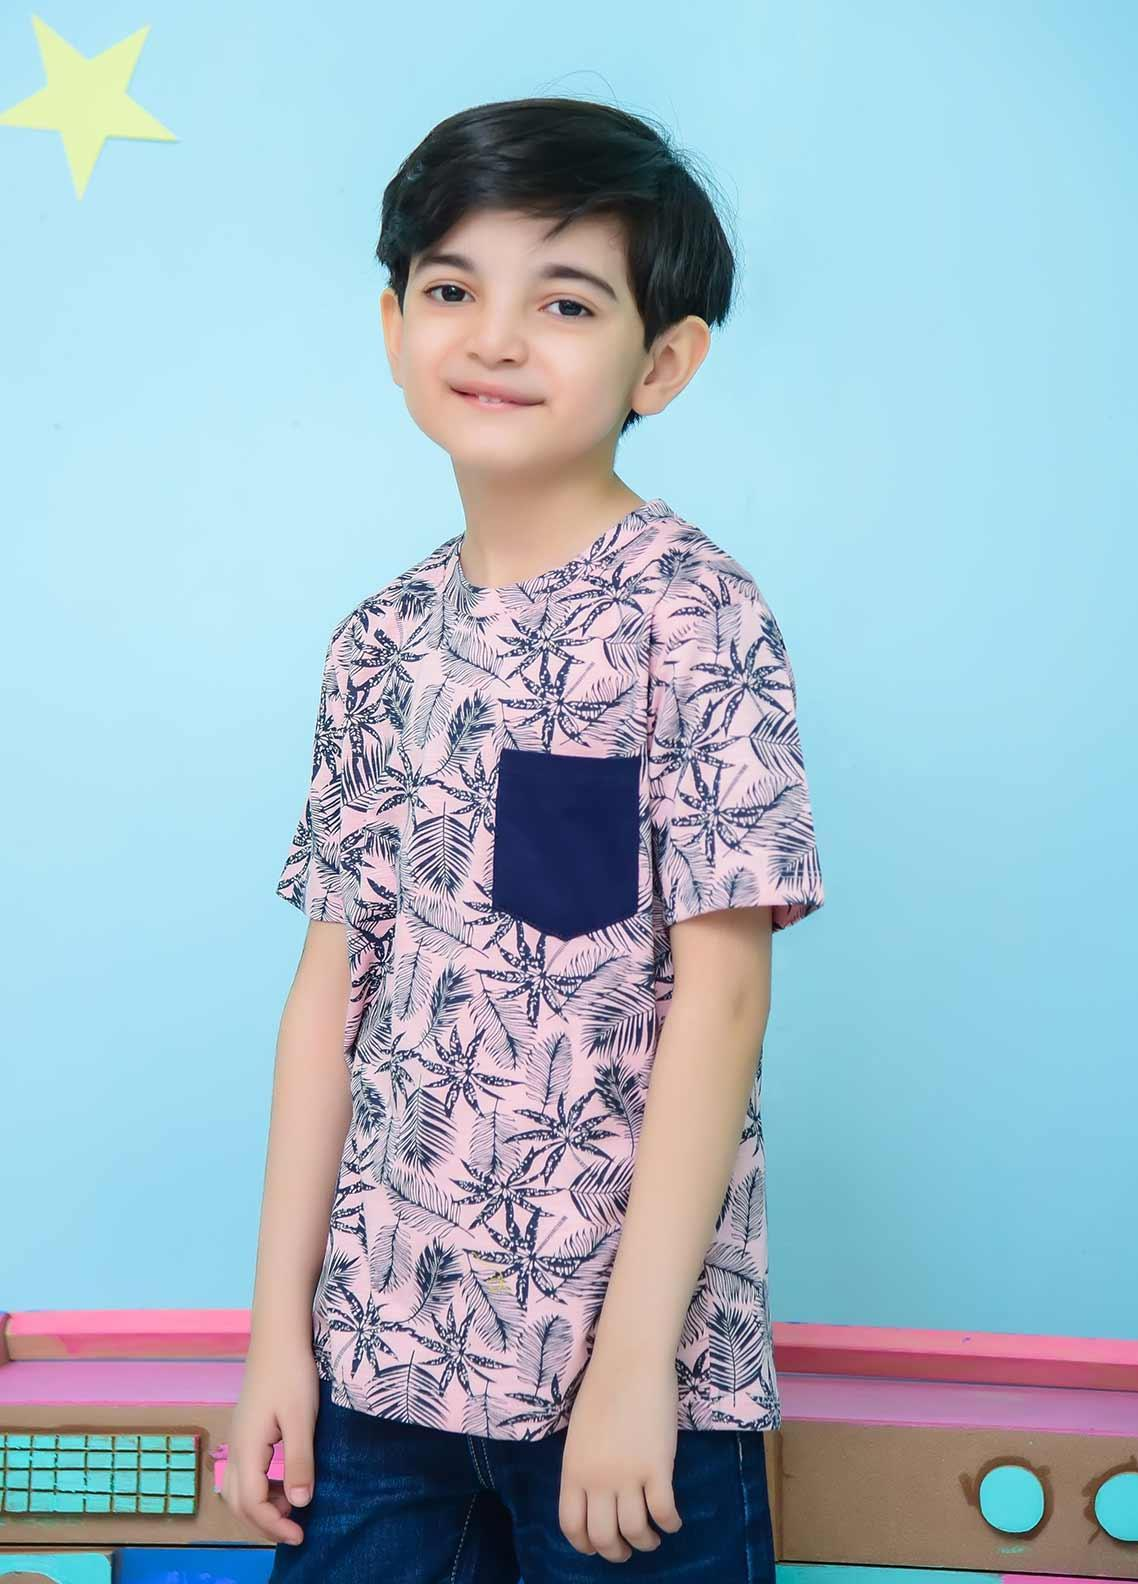 Ochre Cotton Casual T-Shirts for Boys - OKB 60 Heather Grey